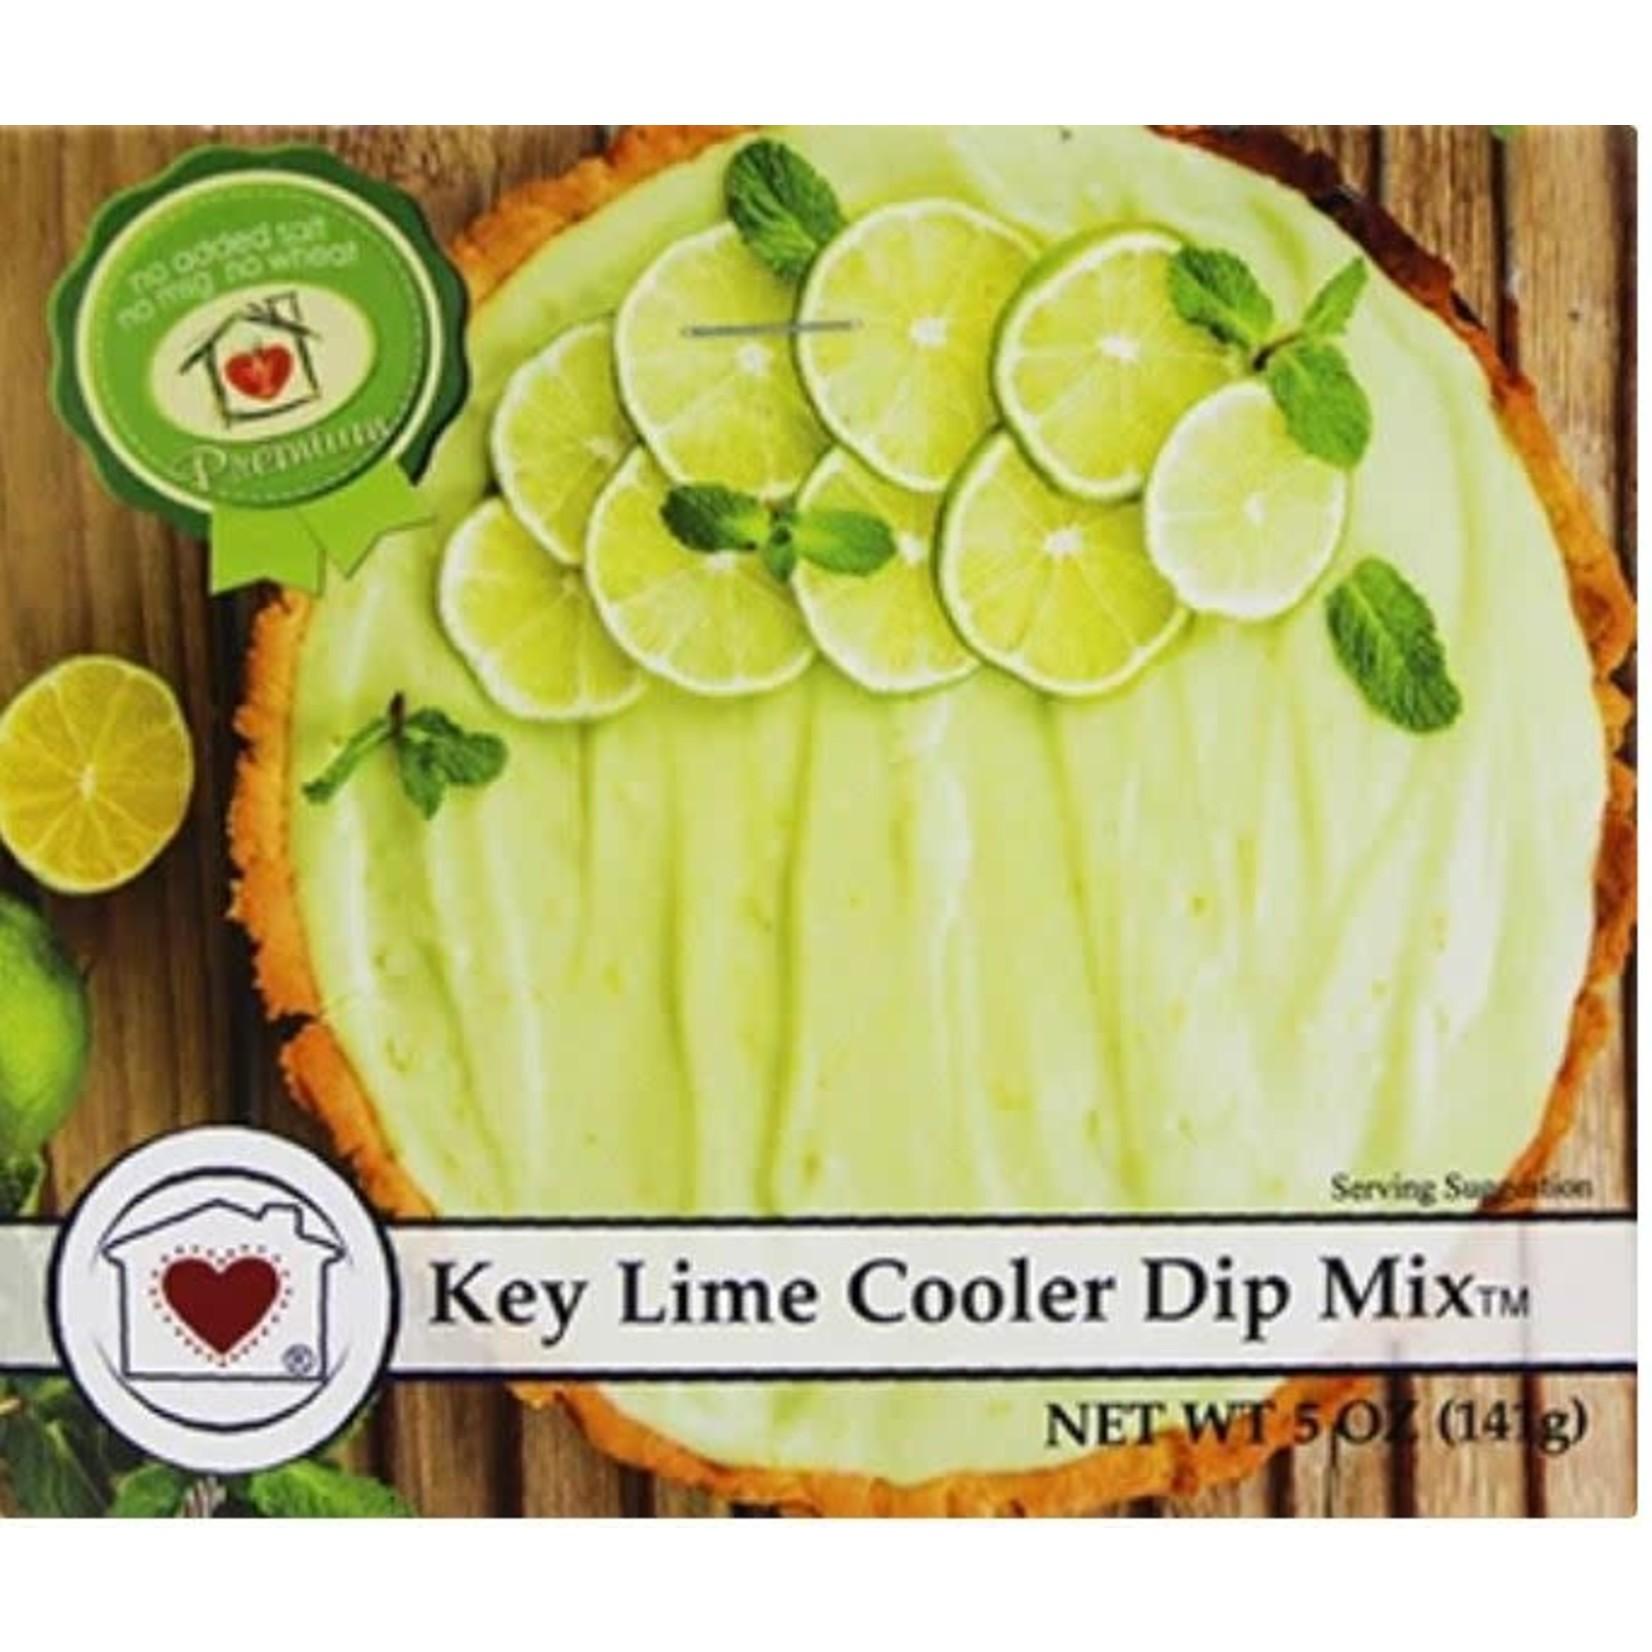 KEY LIME COOLER DIP MIX